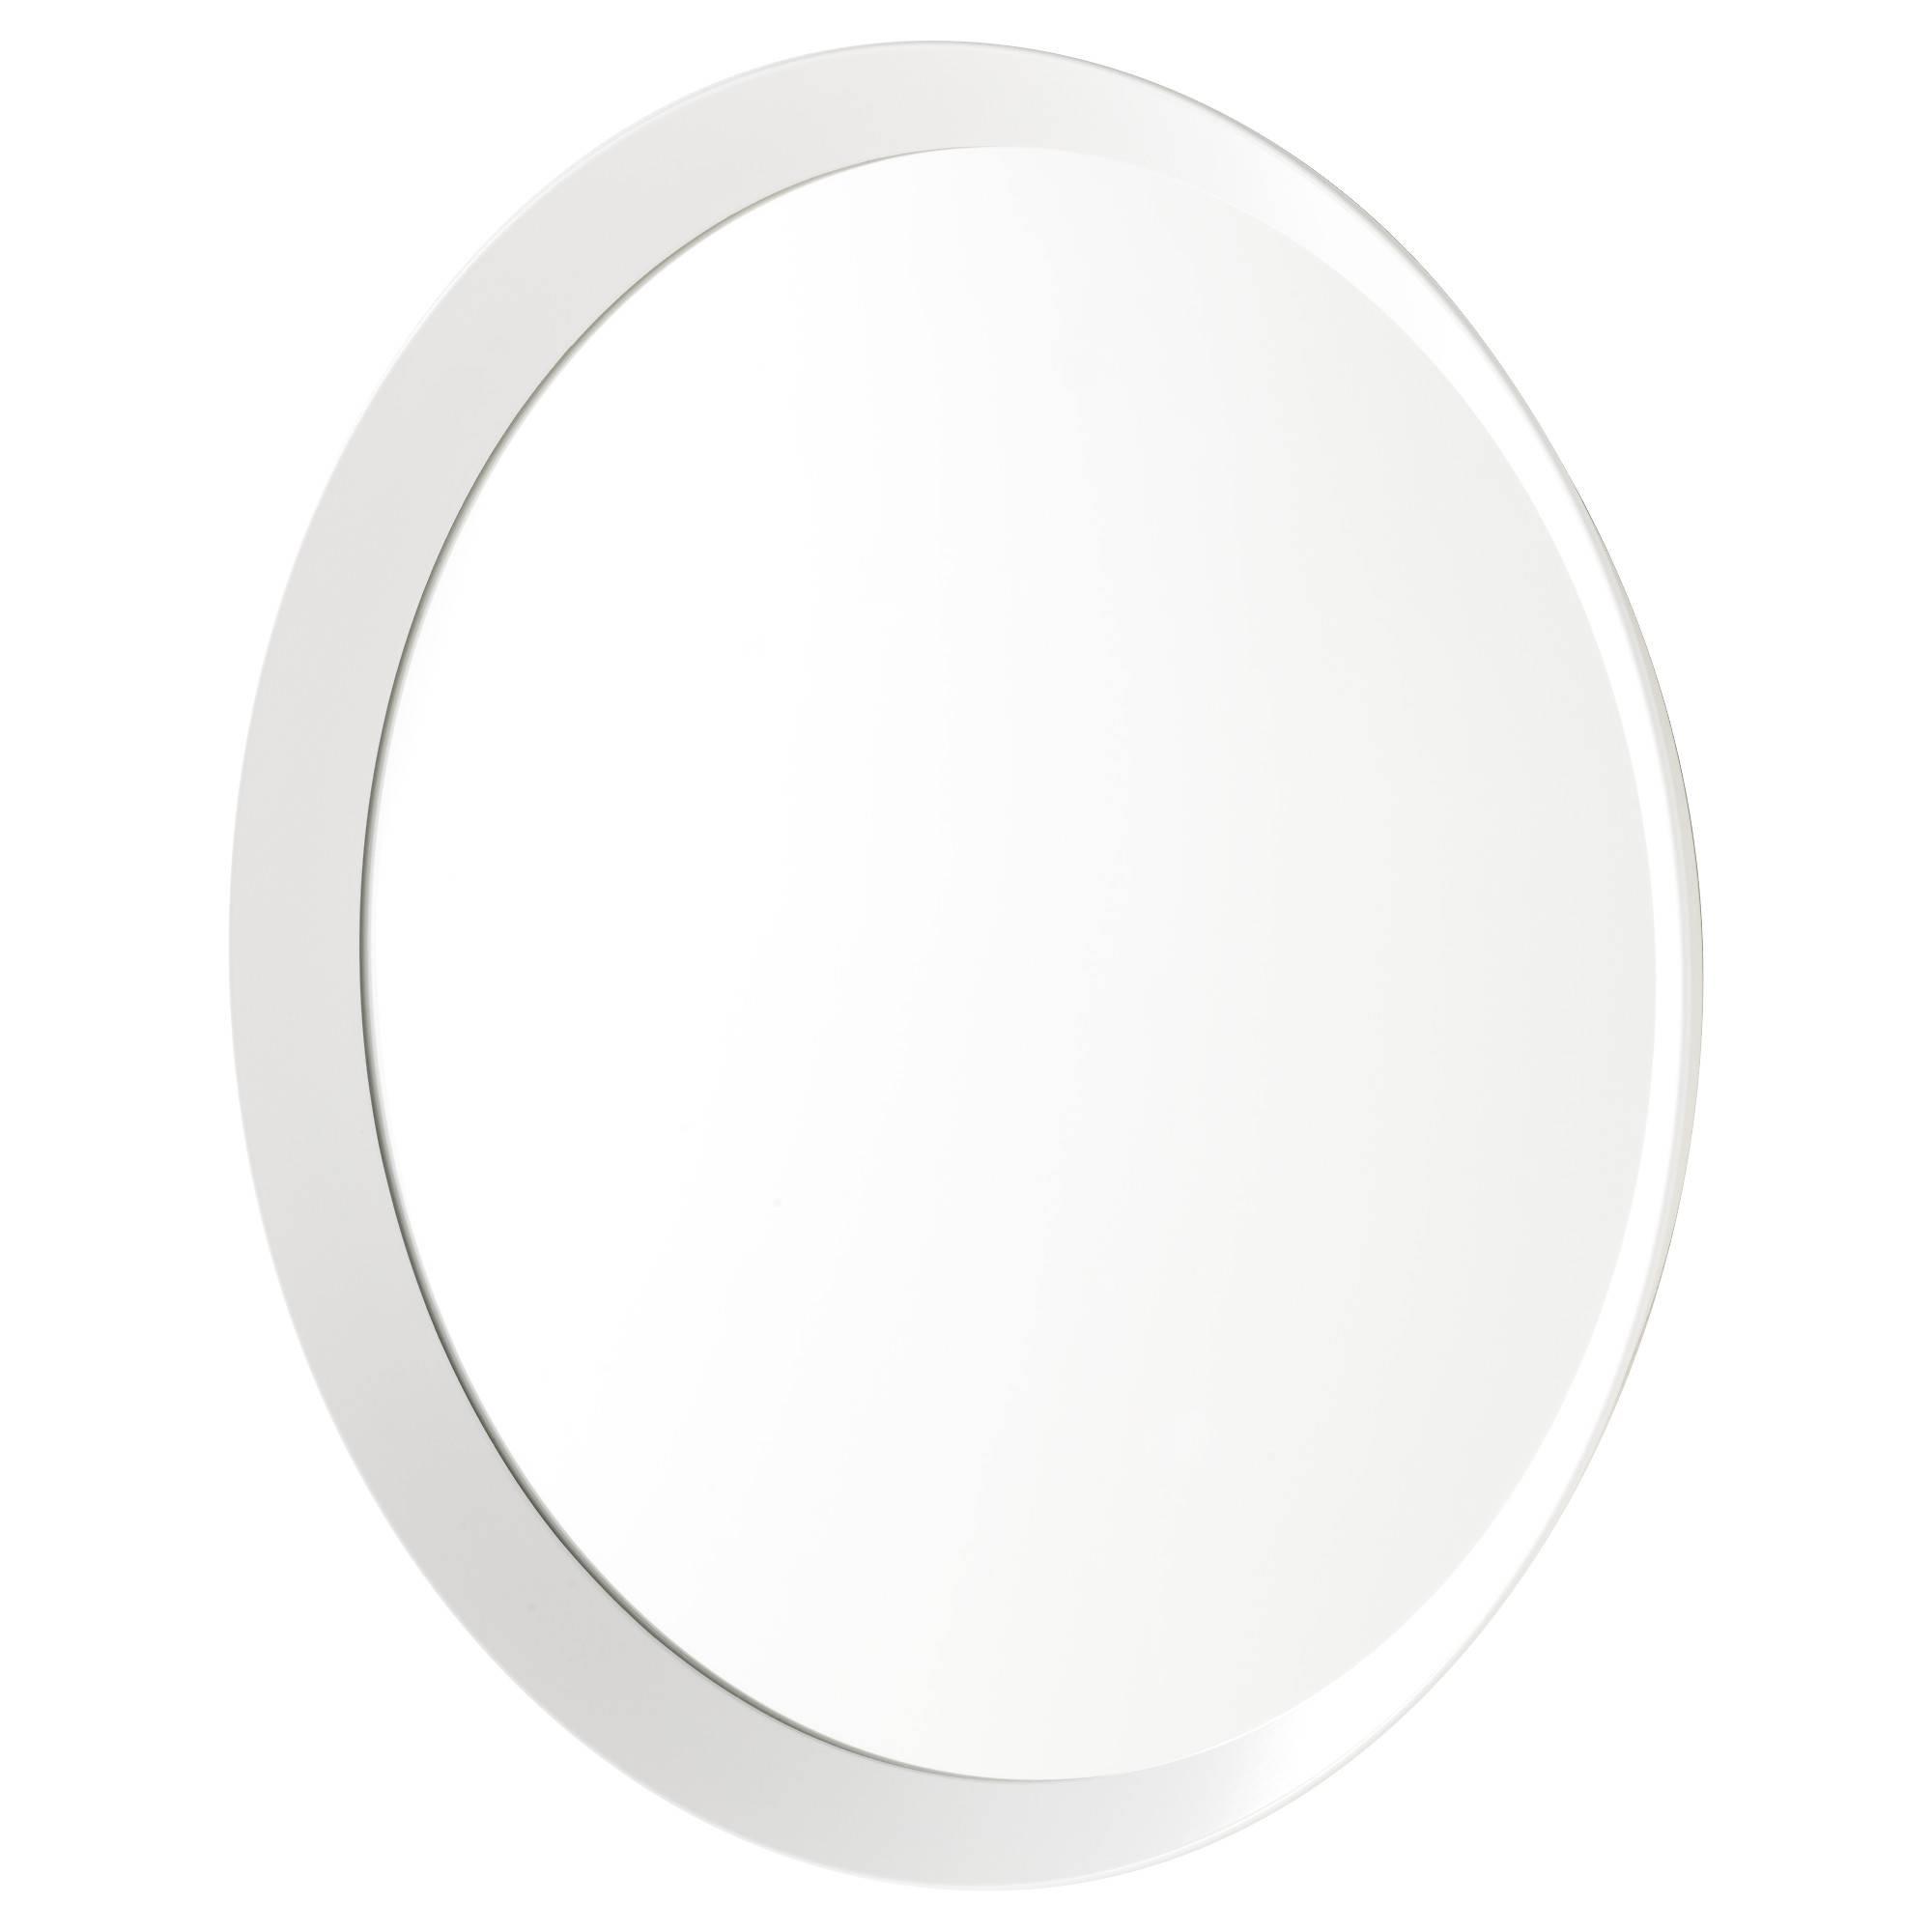 Round Mirrors - Circular & Oval Mirrors - Ikea within White Round Mirrors (Image 10 of 15)